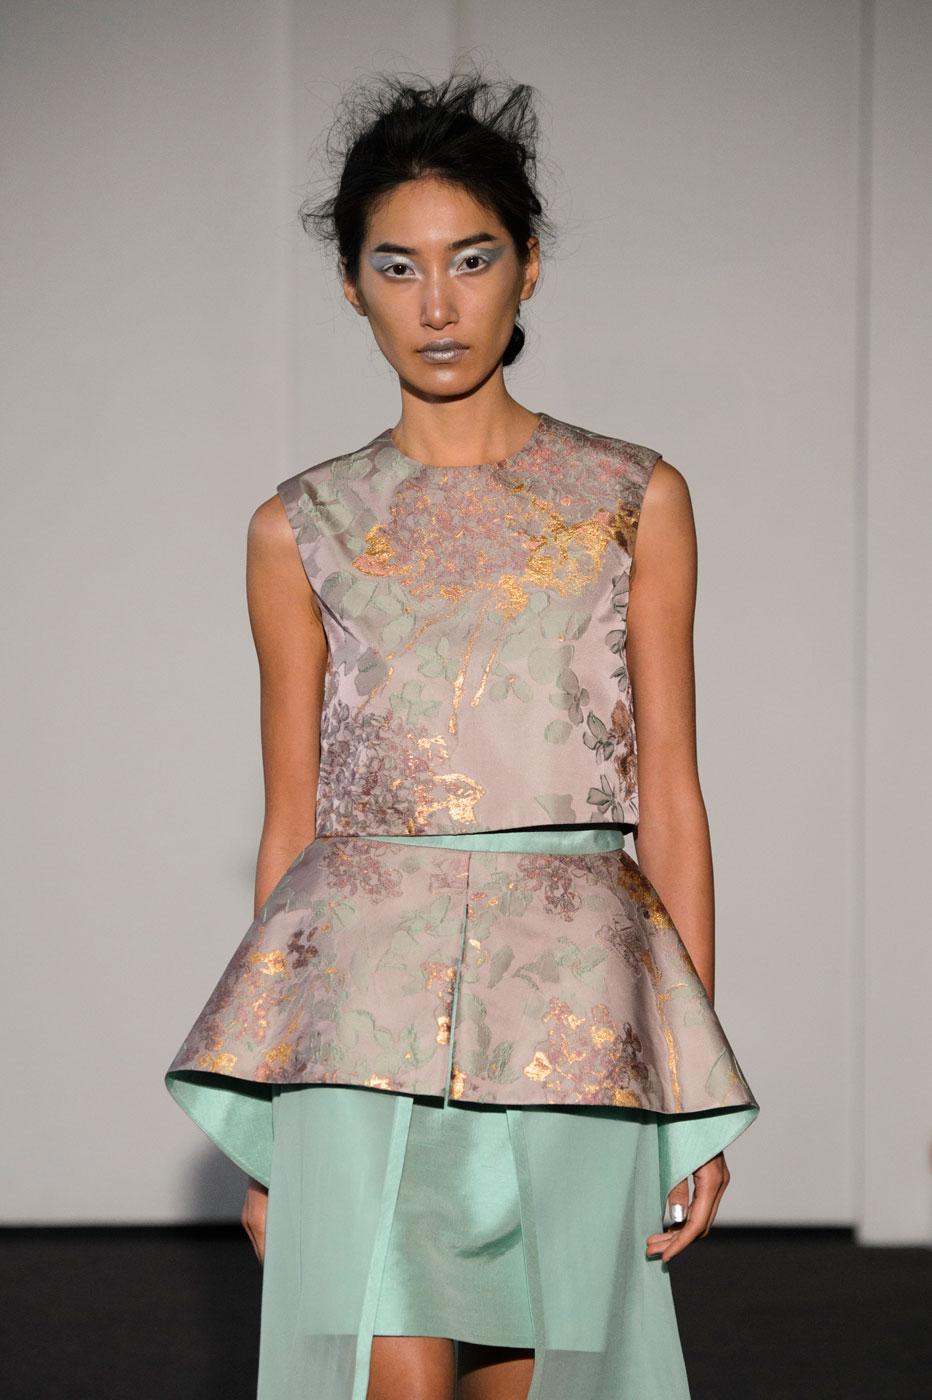 Busardi-fashion-runway-show-haute-couture-paris-spring-2015-the-impression-26